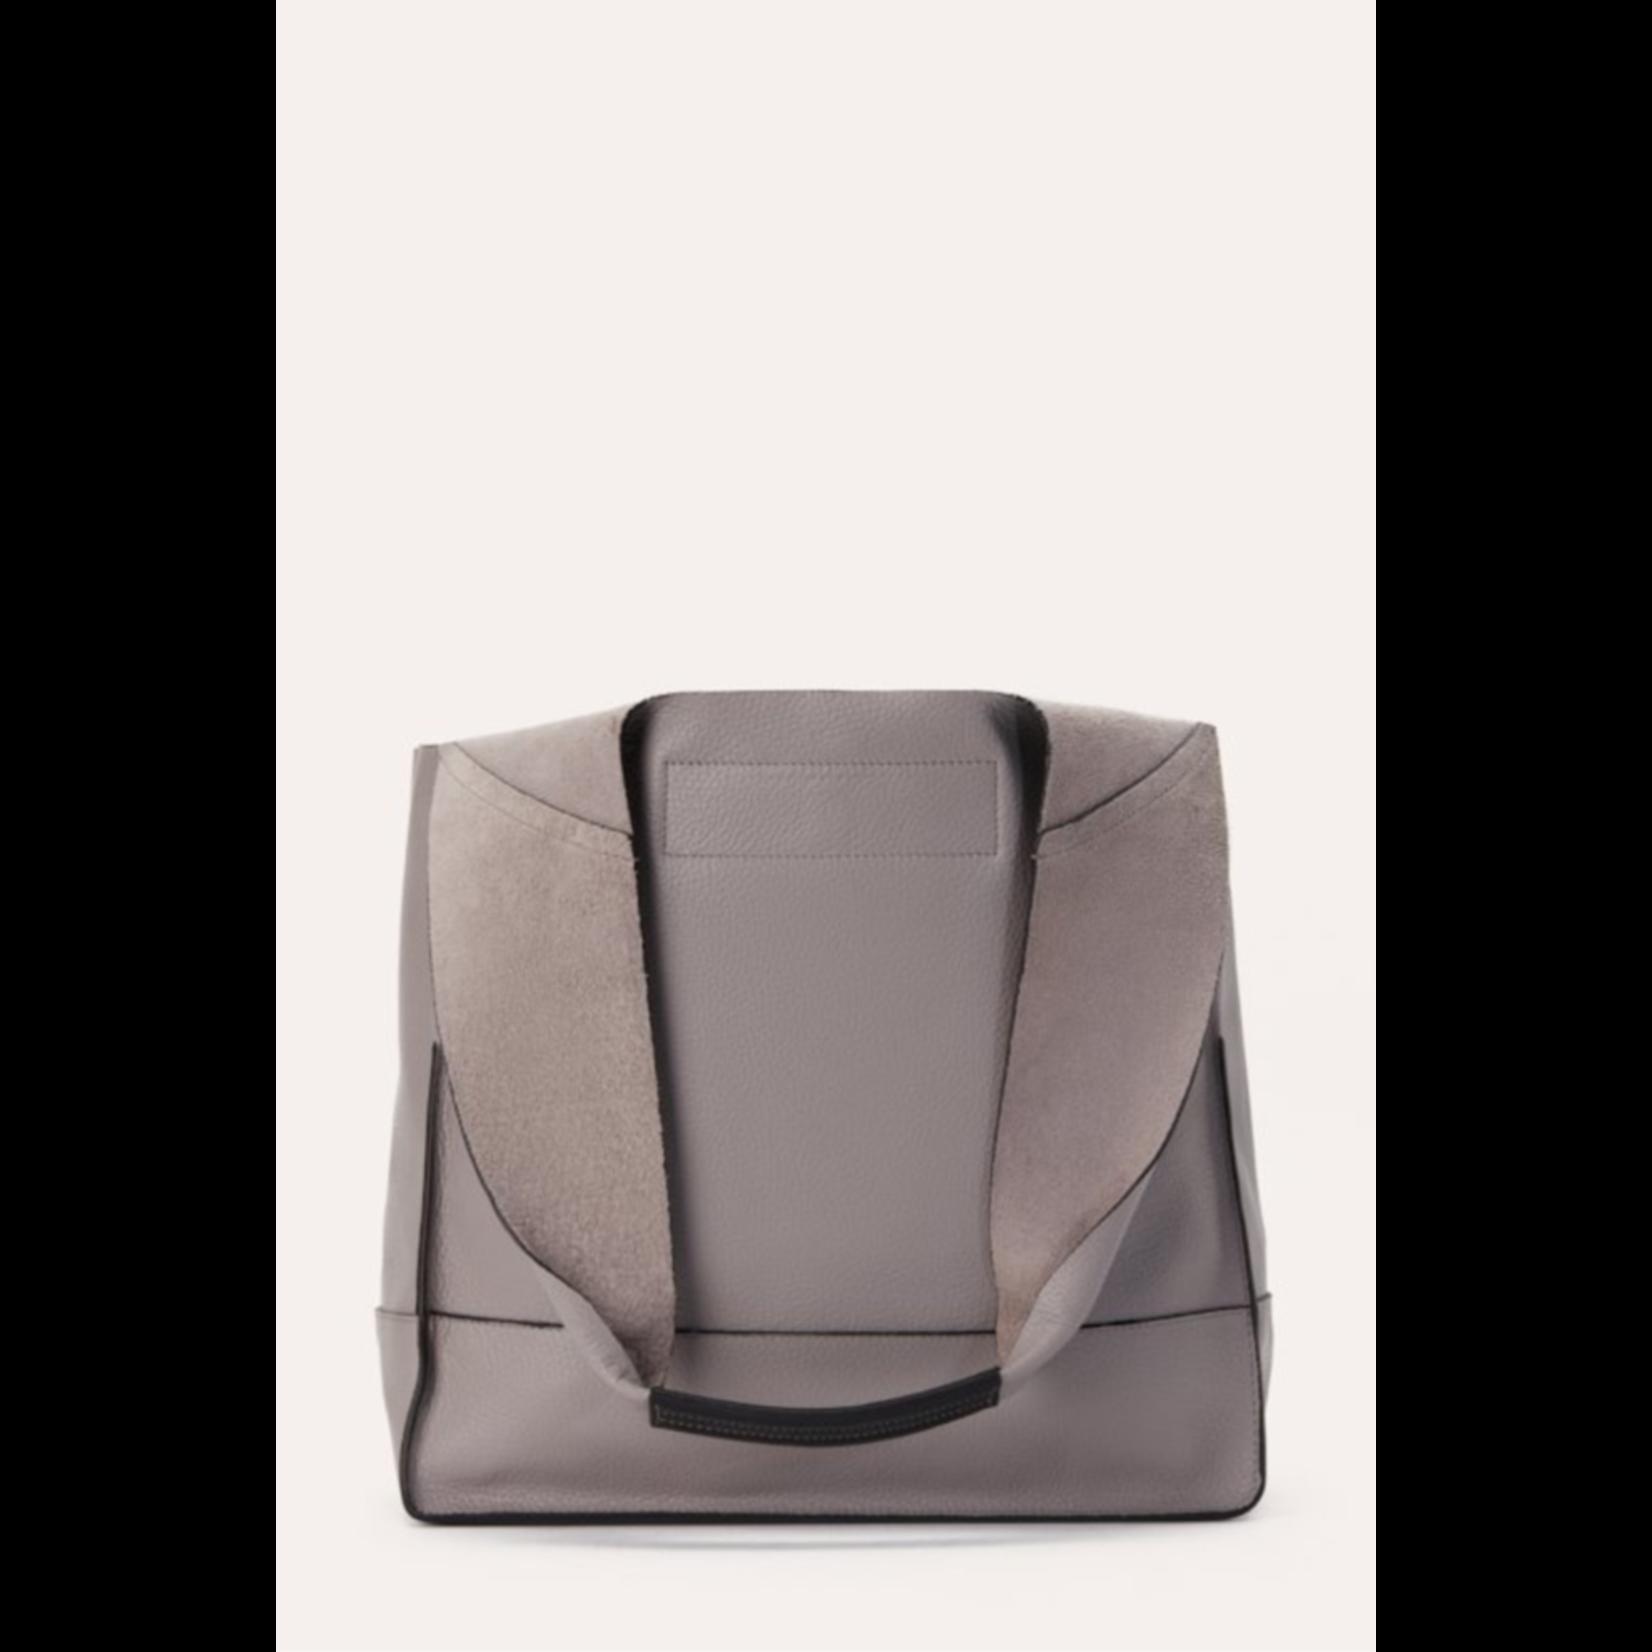 Kiko Leather Leather Modern Tote